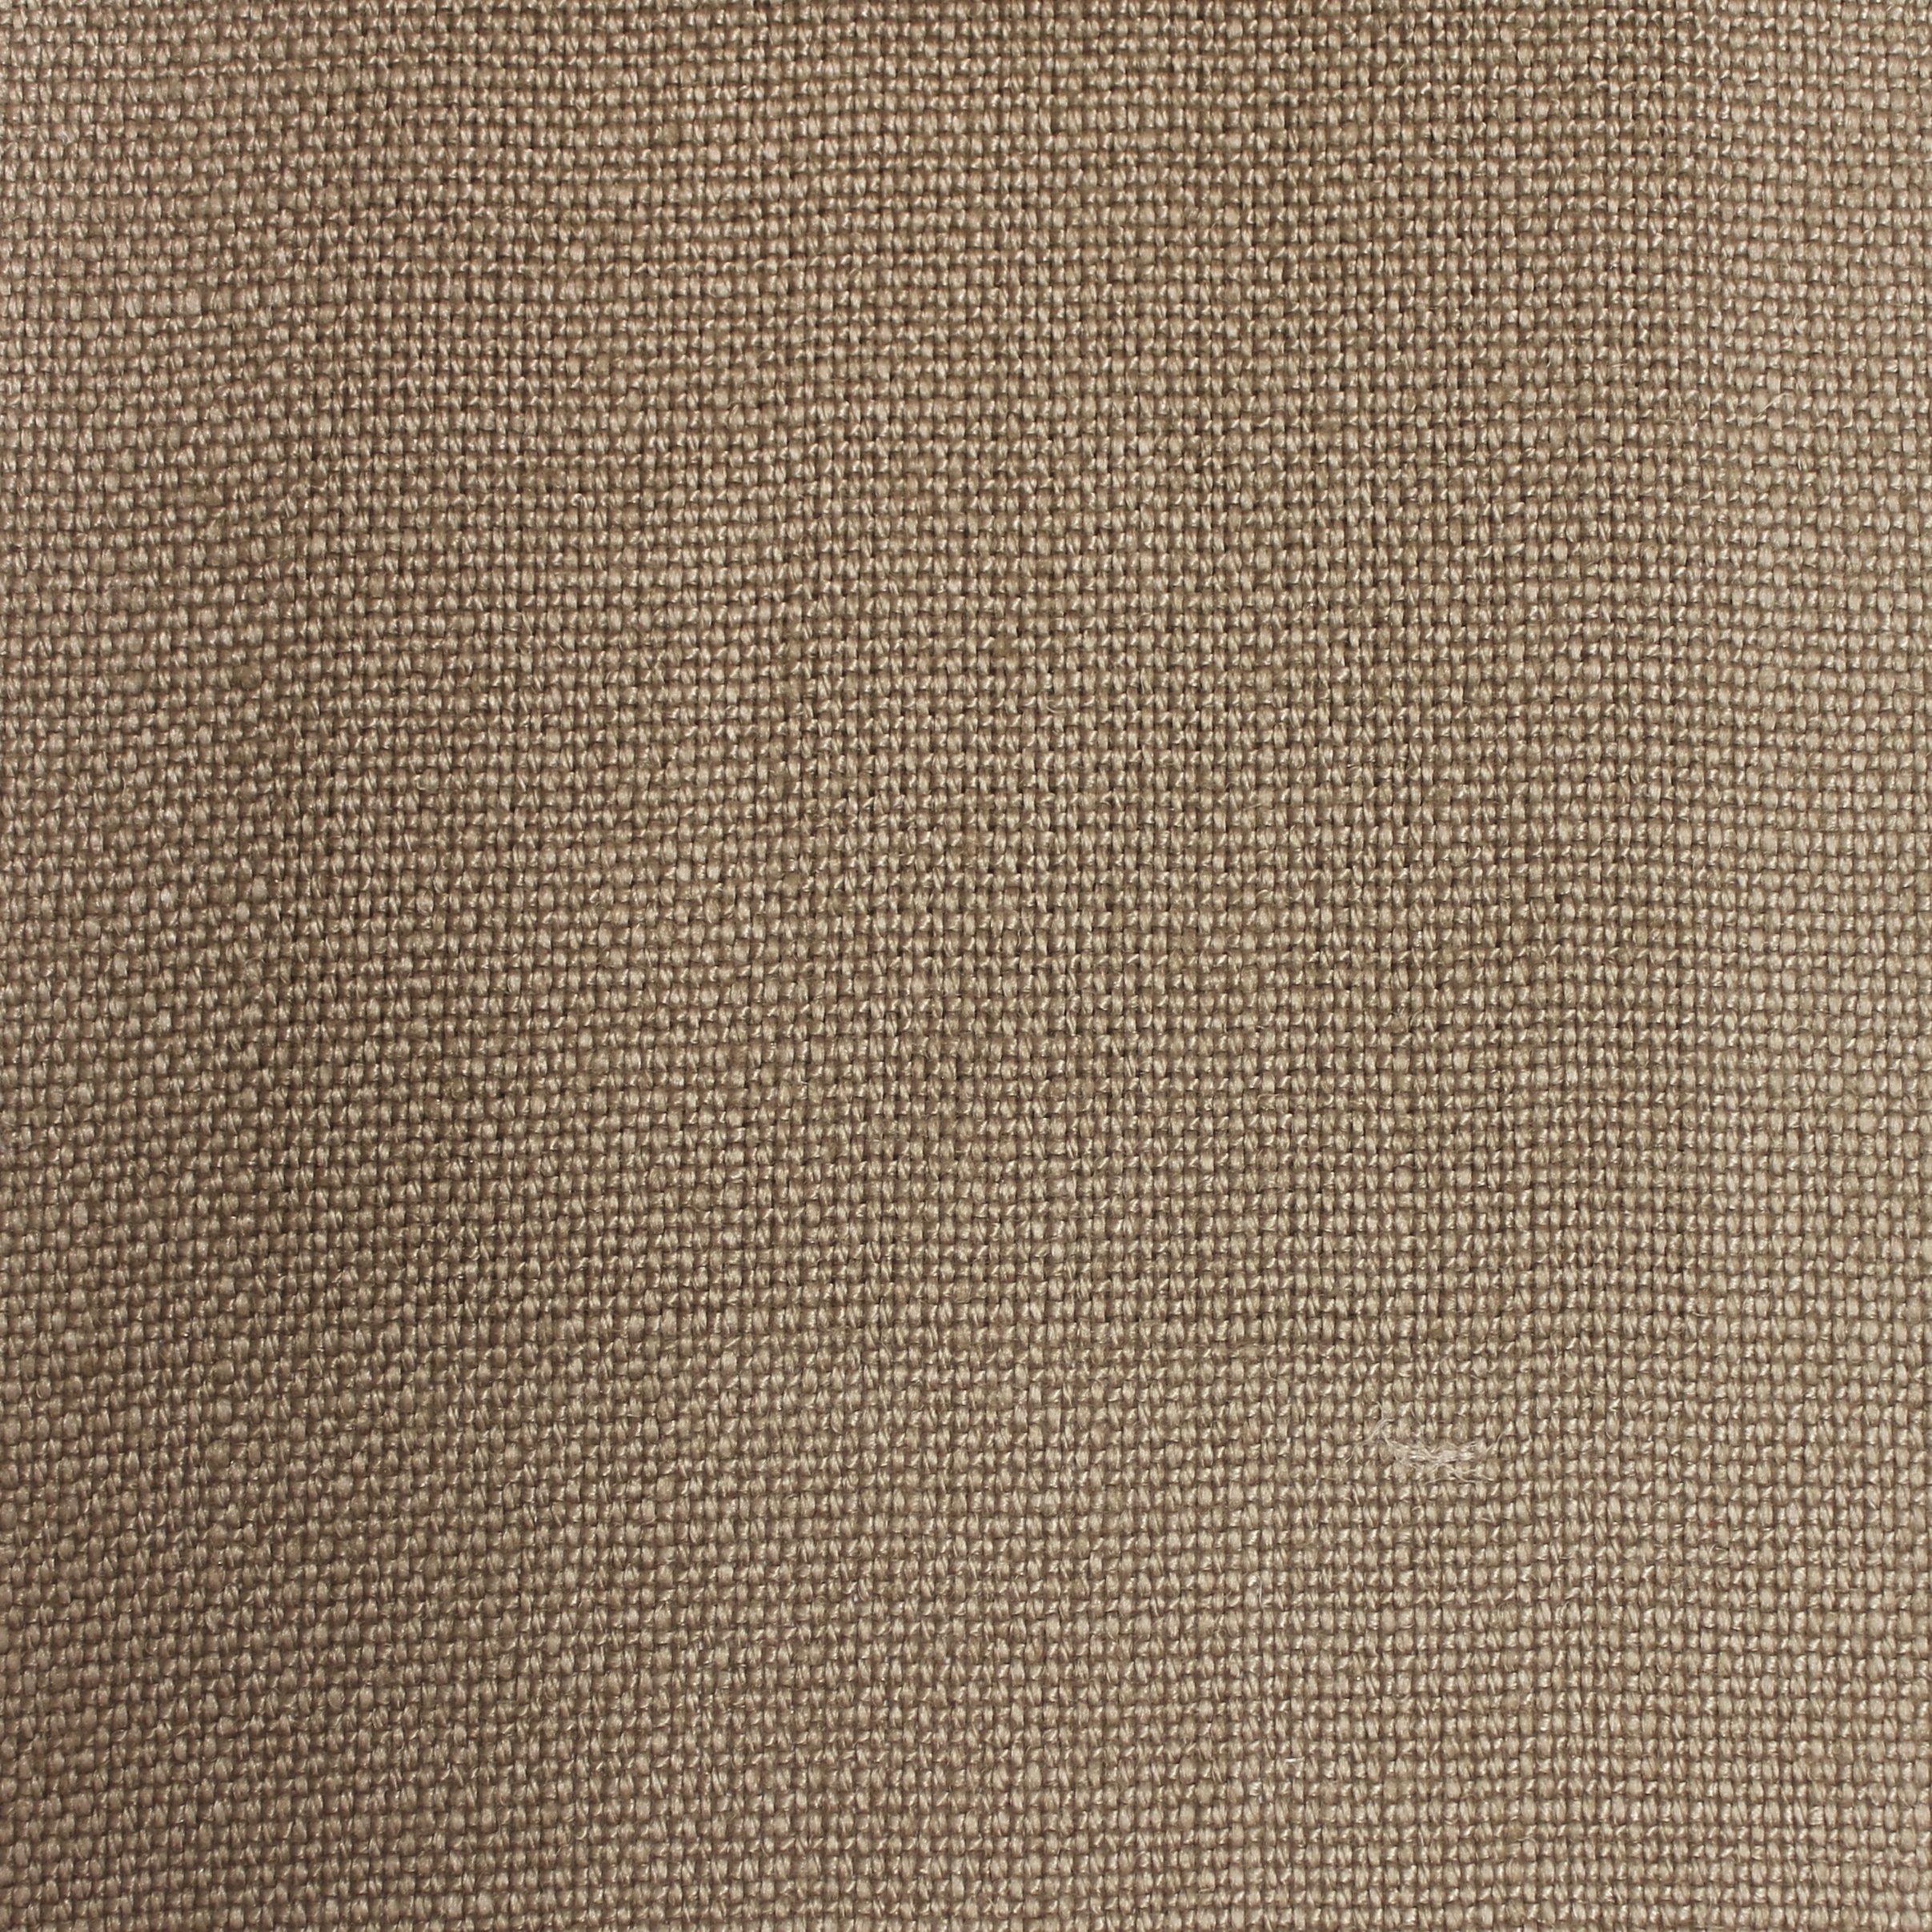 Slubby Linen Sepia